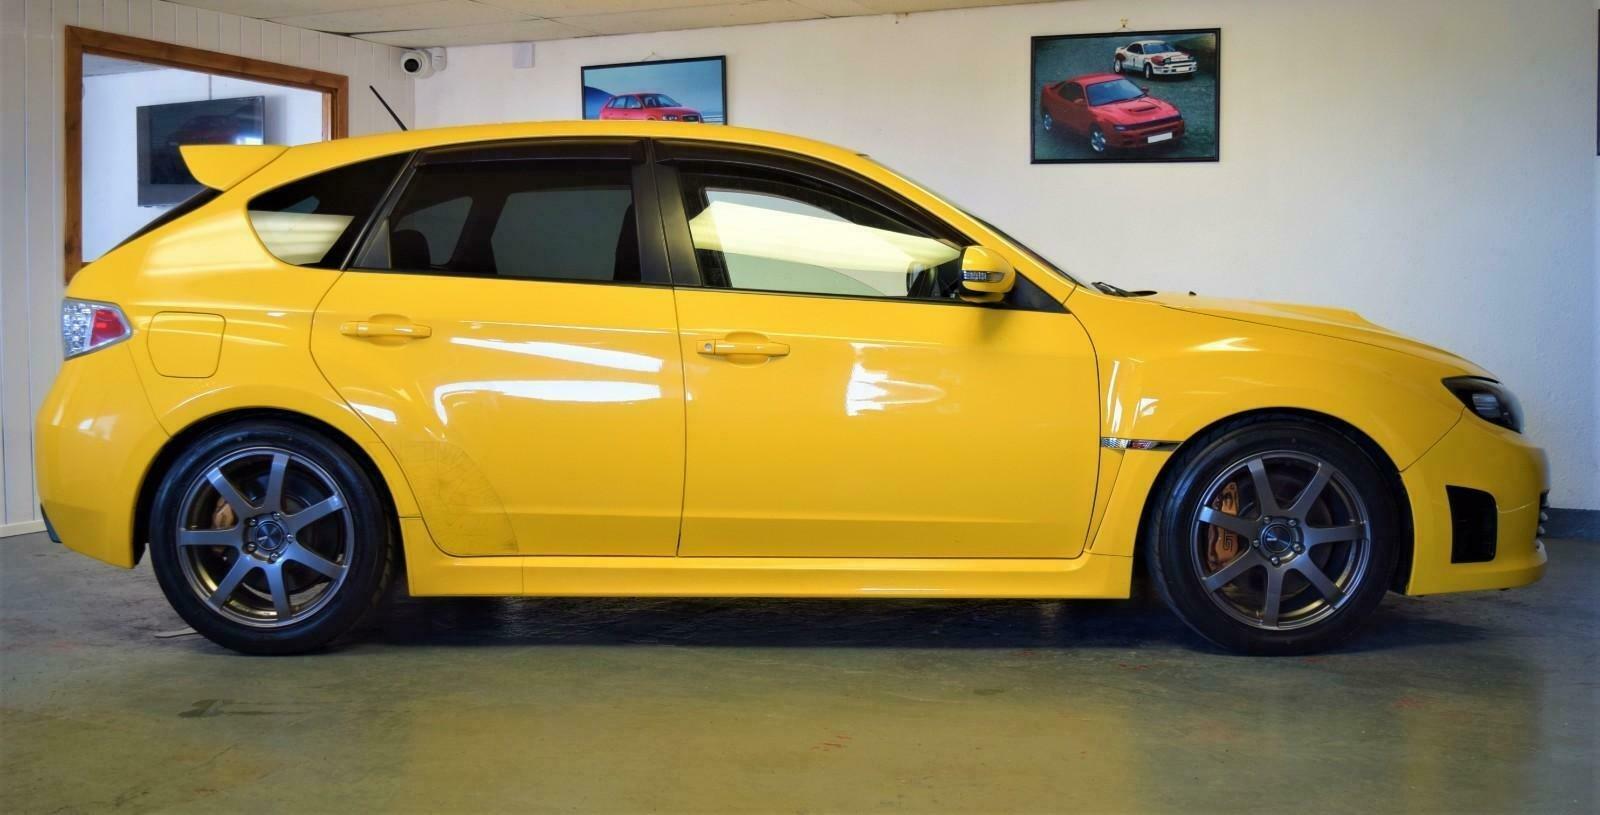 2009 Subaru Impreza 2.0 WRX STi Spec-C JDM Import Model For Sale (picture 3 of 12)